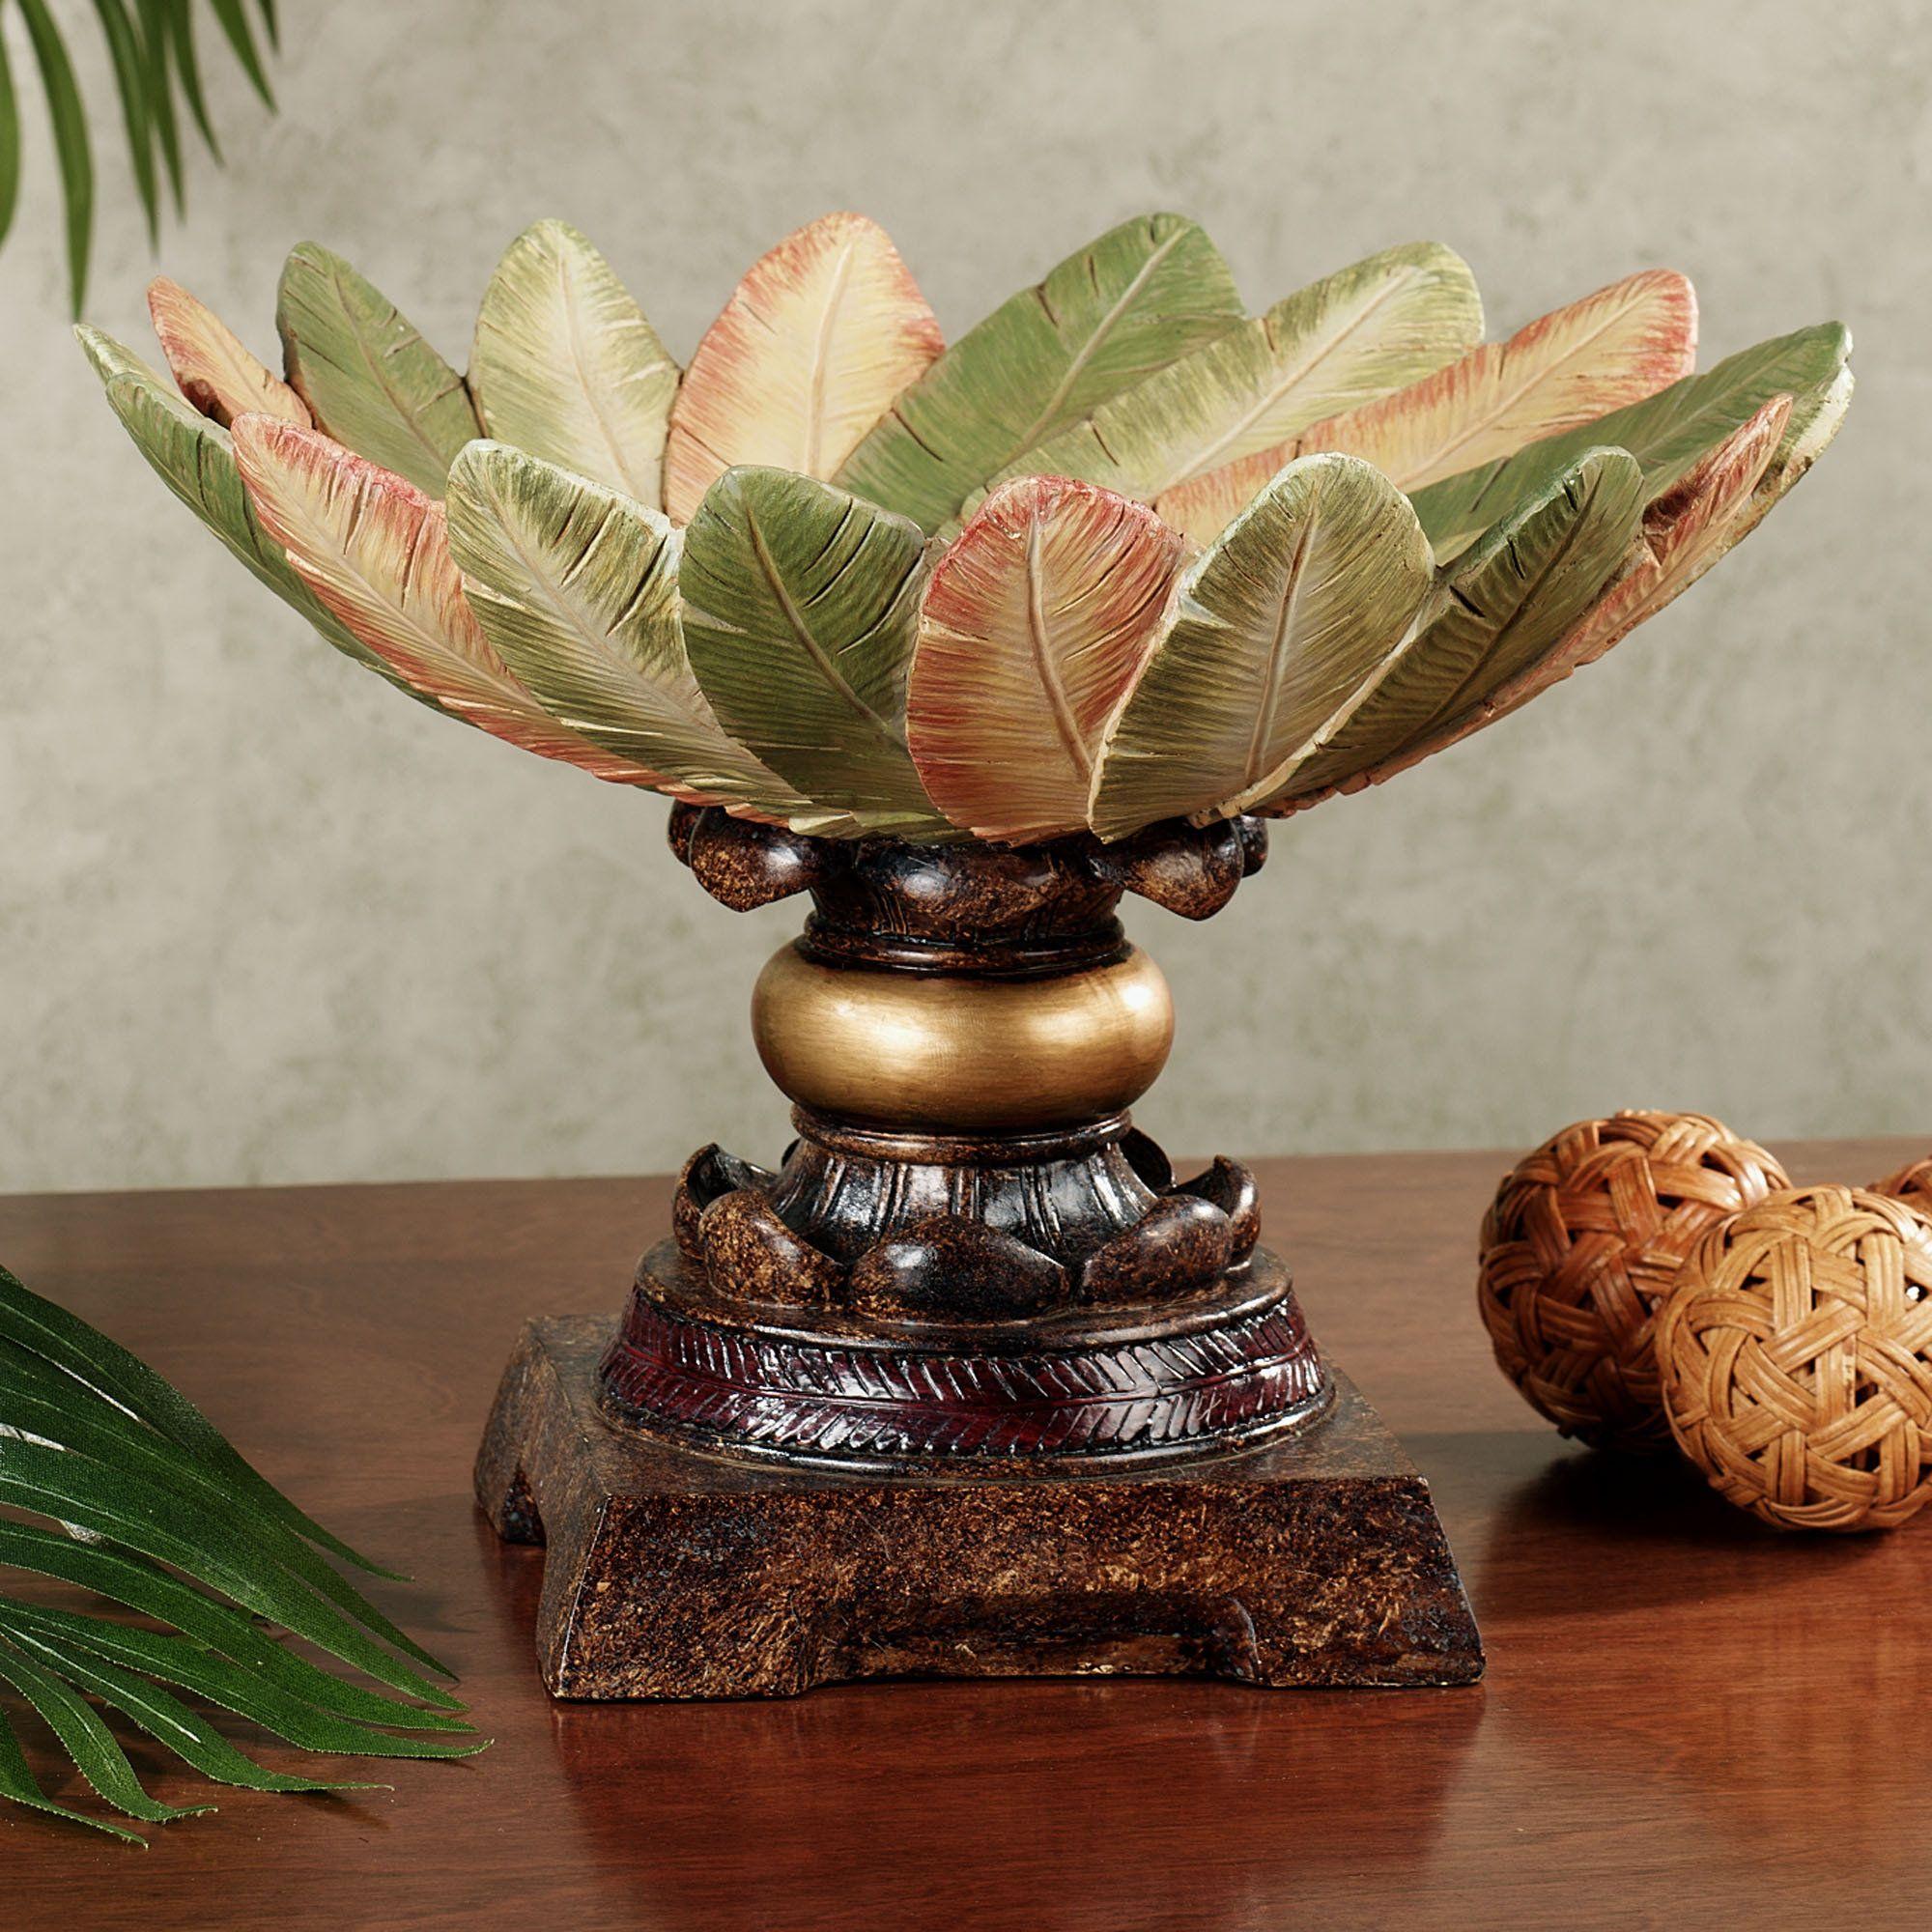 Island Memories Decorative Centerpiece Bowl